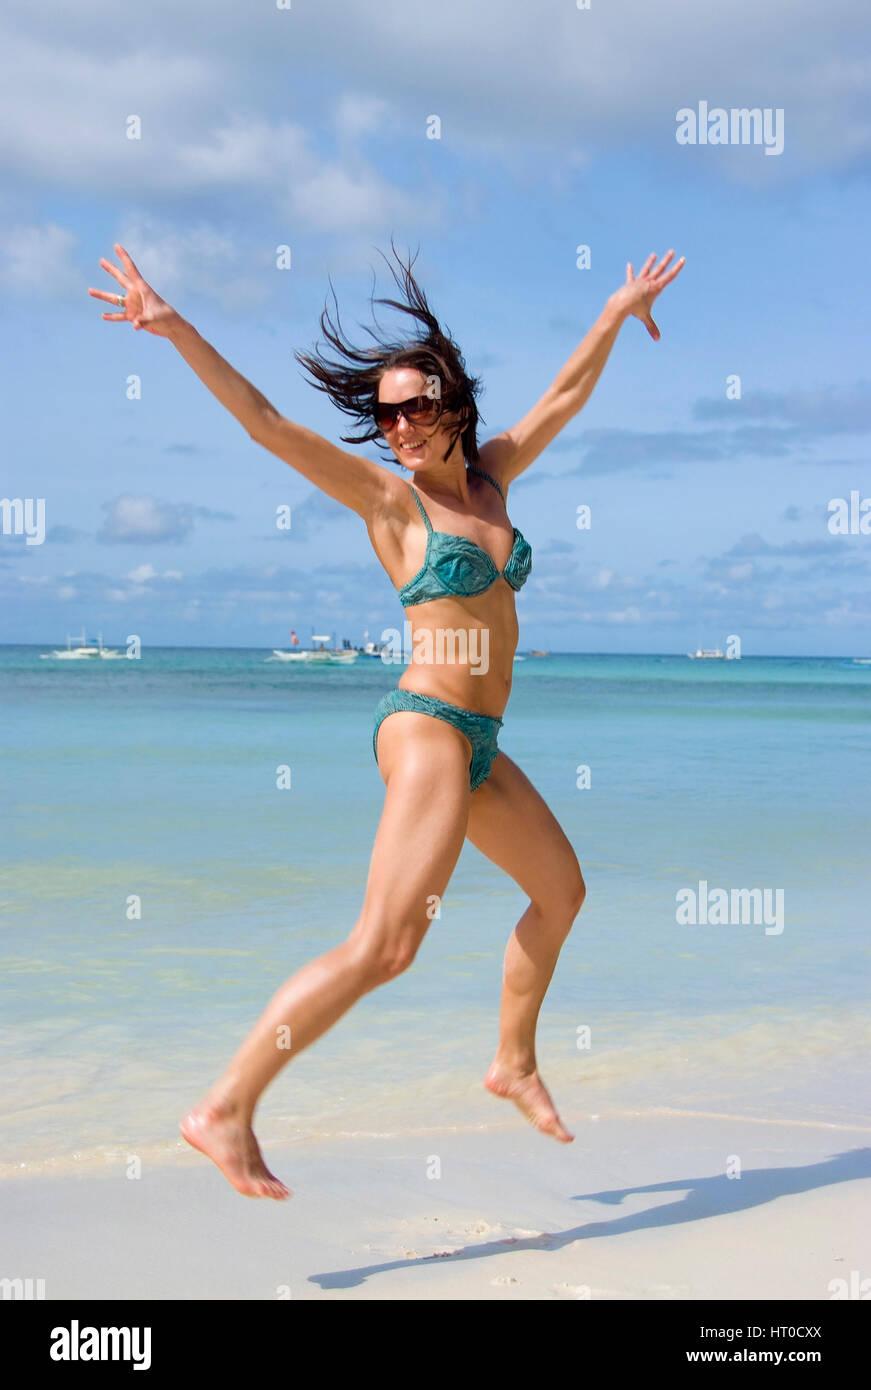 Junge, vitale Frau im Bikini springt am Strand - joven saltando en la playa Foto de stock